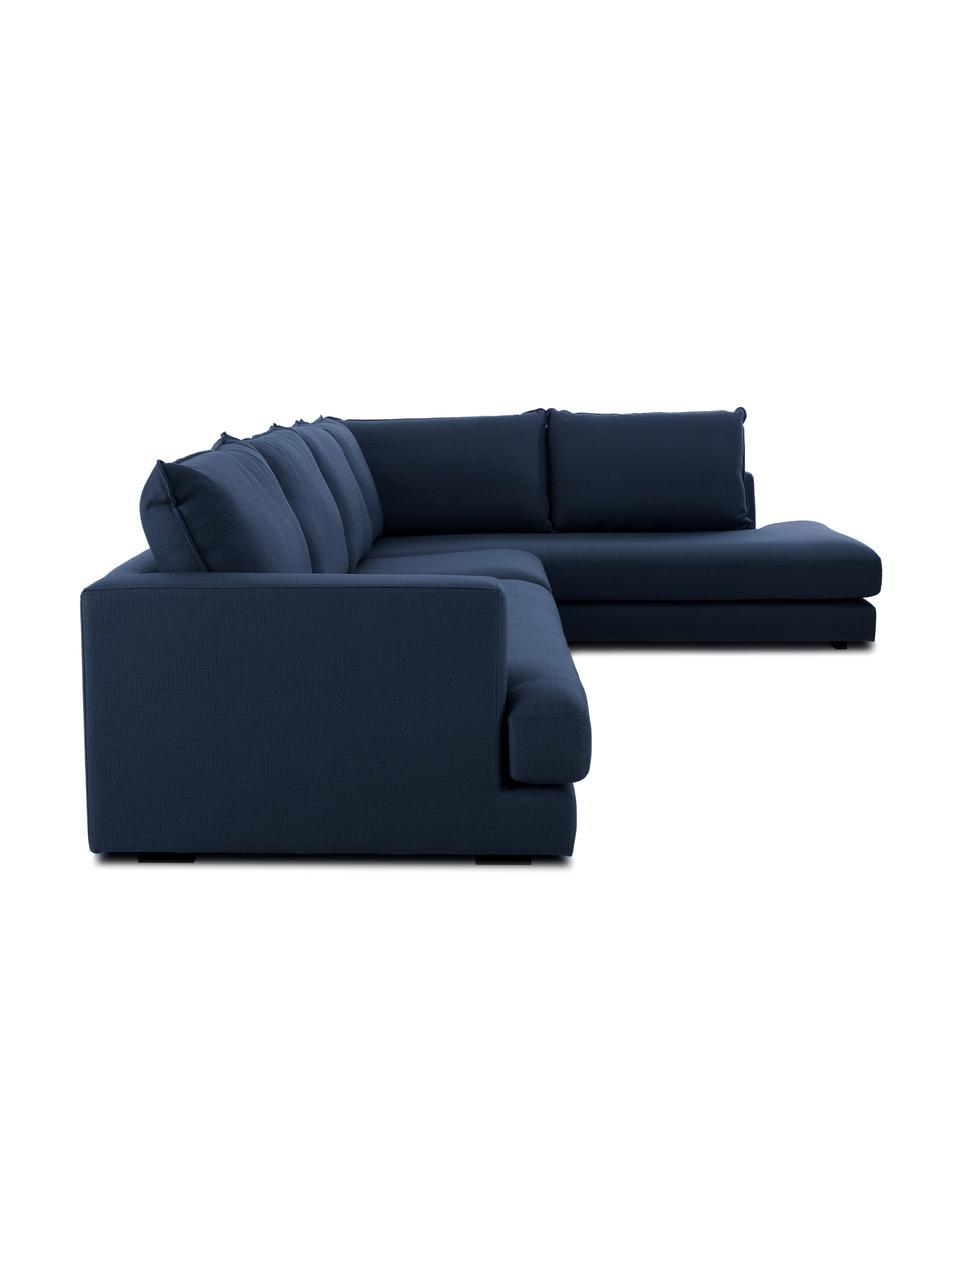 XL hoekbank Tribeca in donkerblauw, Bekleding: 100% polyester, Frame: massief beukenhout, Poten: massief gelakt beukenhout, Stof donkerblauw, B 405 x D 228 cm